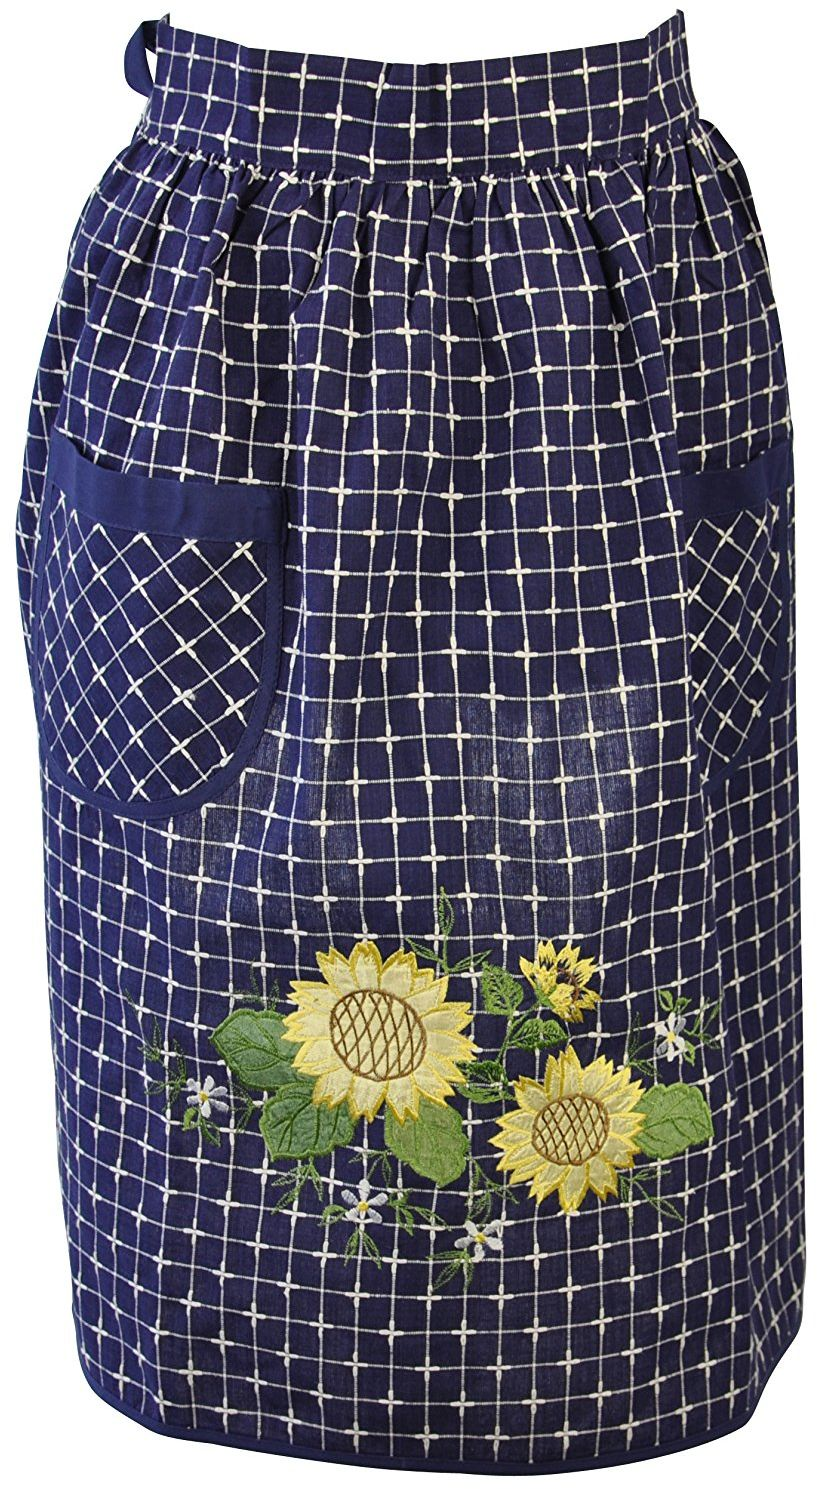 Bellanda Fartuch półochronny, poliester, niebieski, 86 x 66 x 0,5 cm